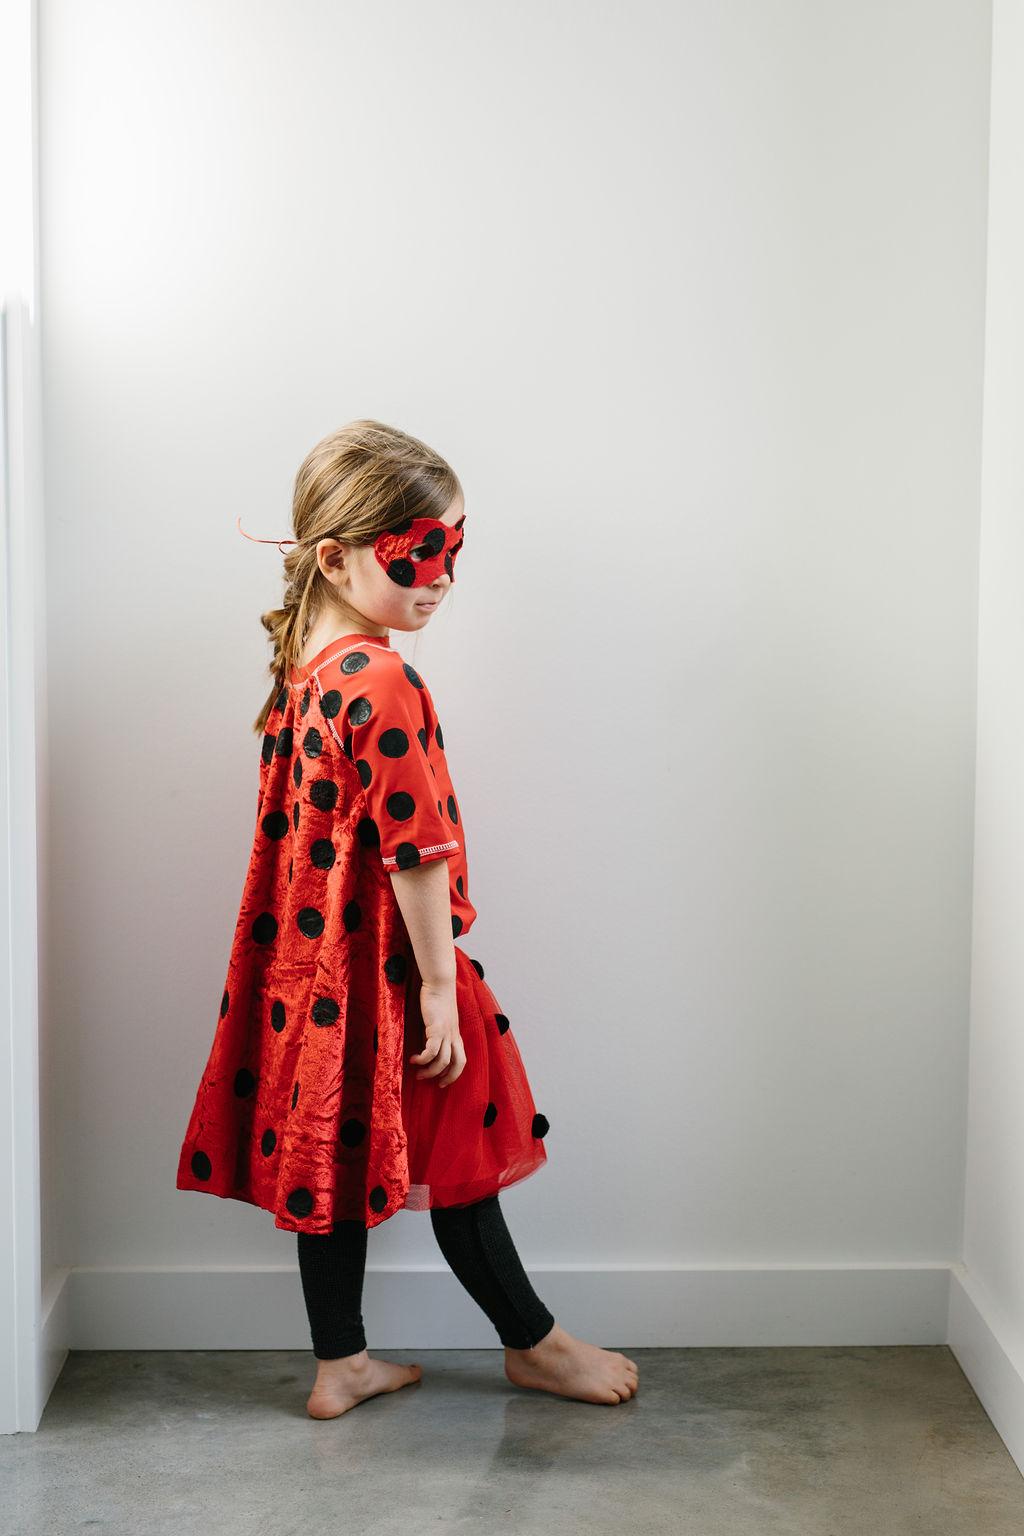 Modelling a miraculous ladybug costume